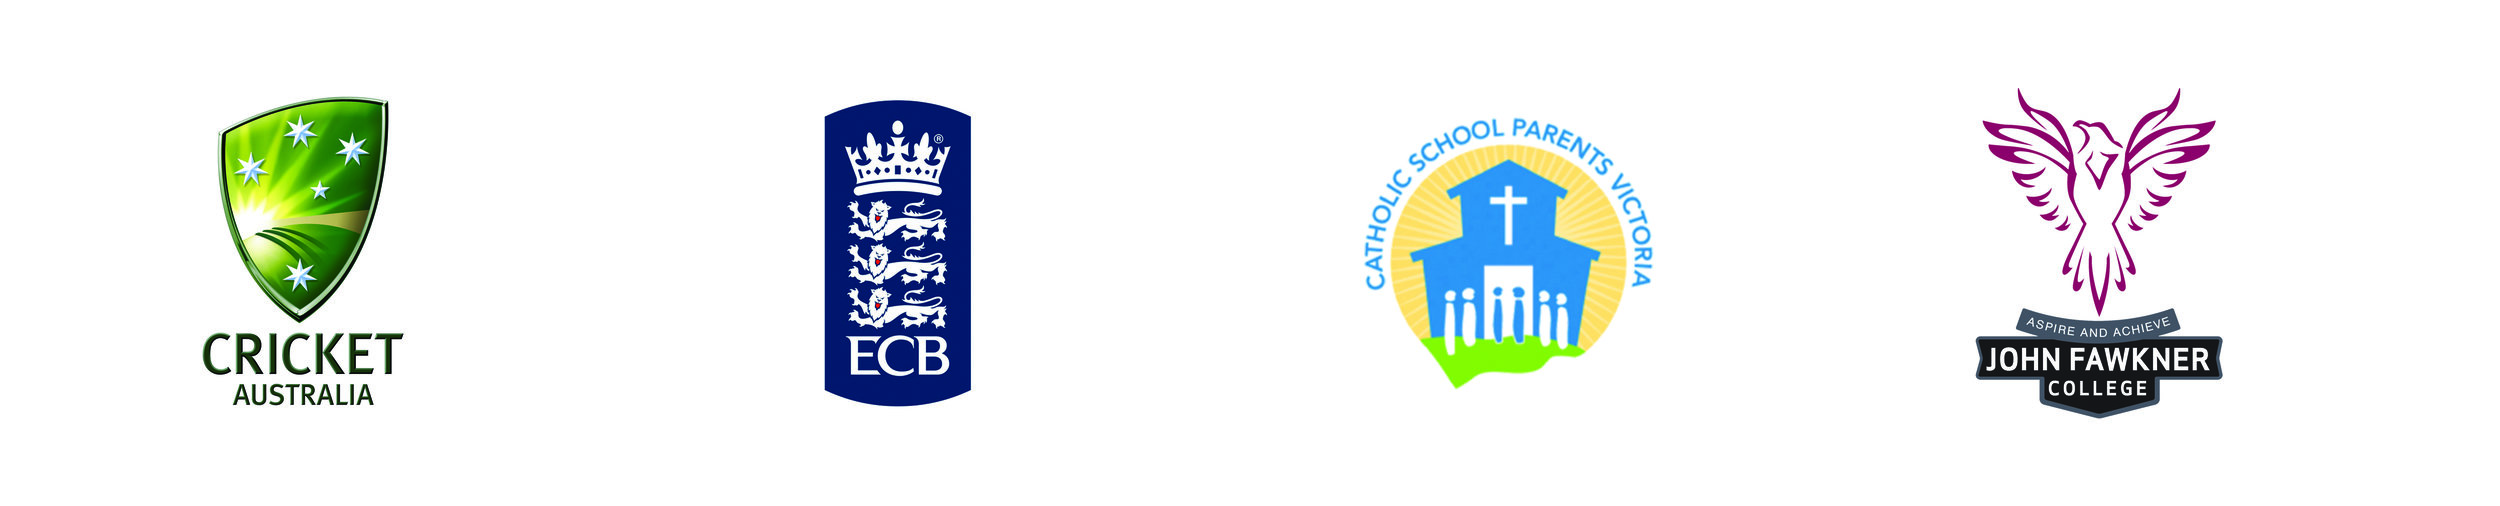 Ed - 3a - All services - new logos.jpg